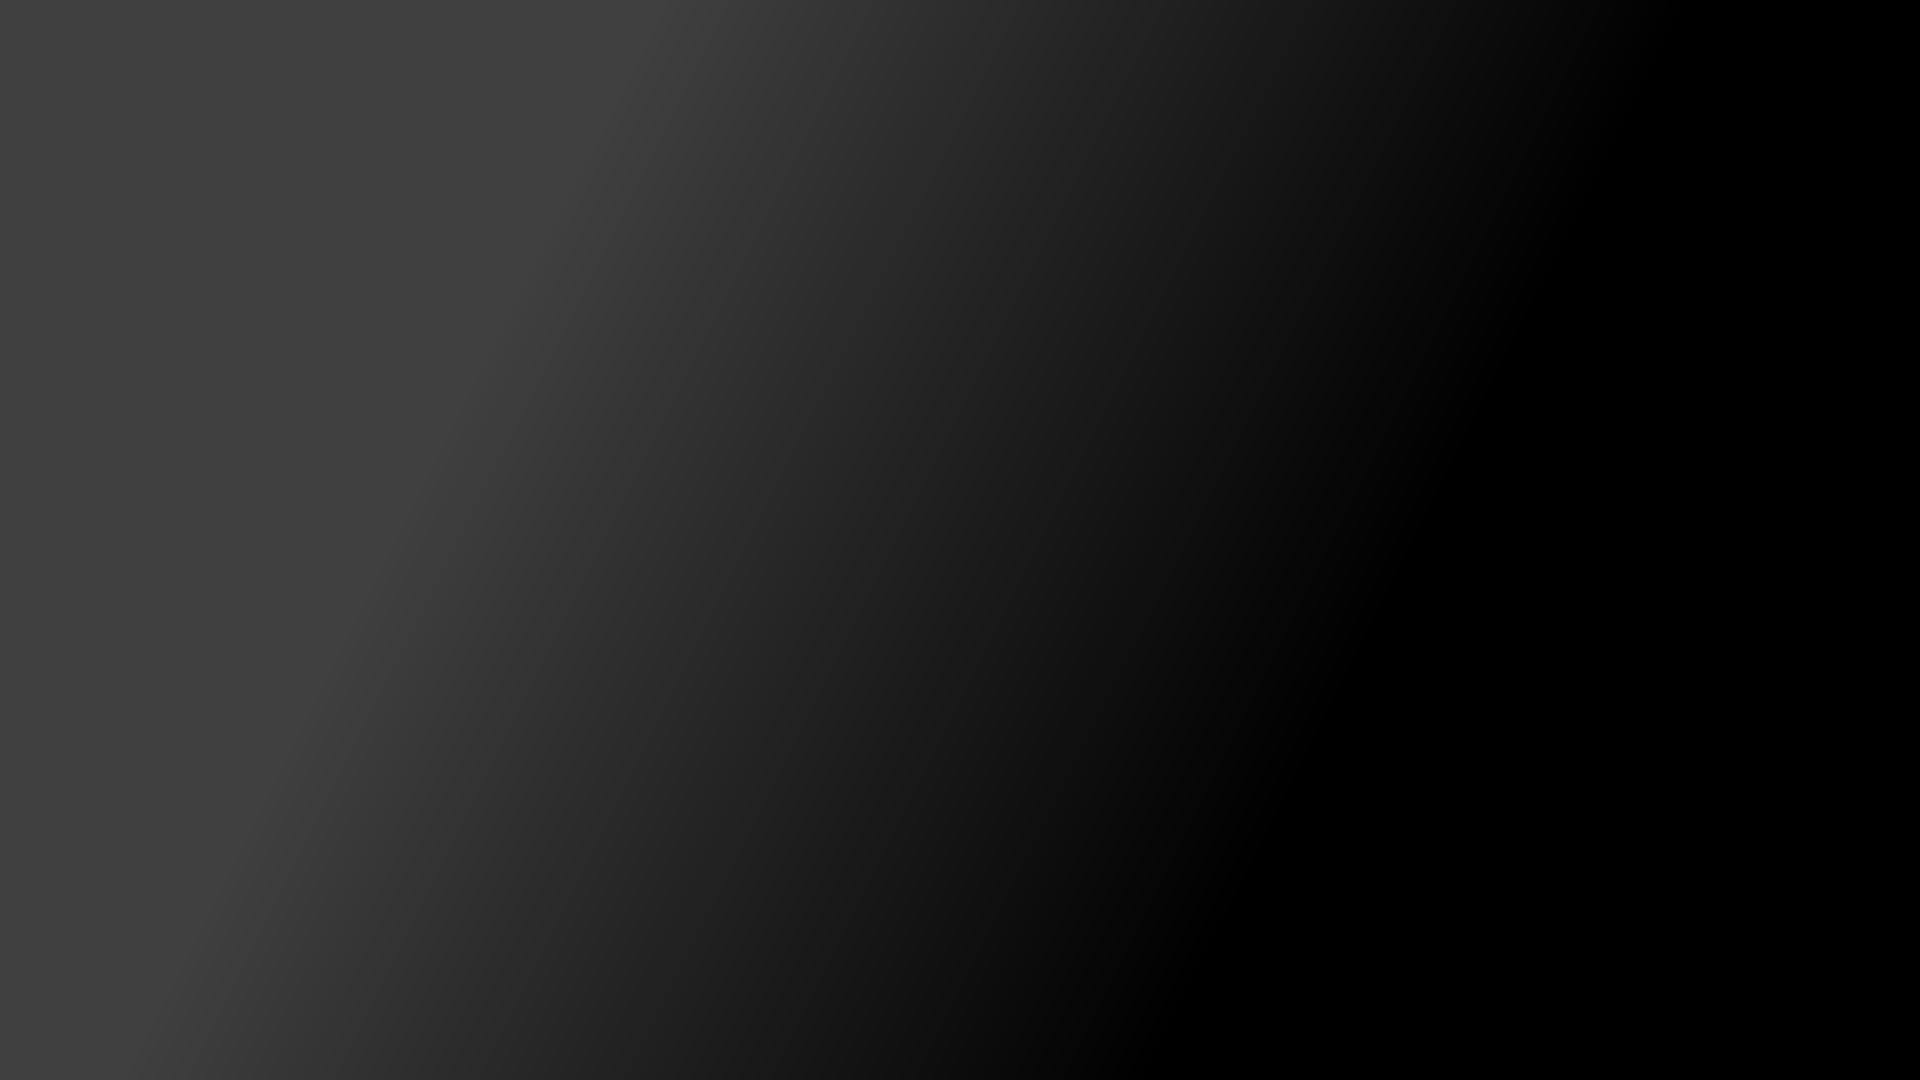 Dark gray black Desktop Wallpaper 1920x1080